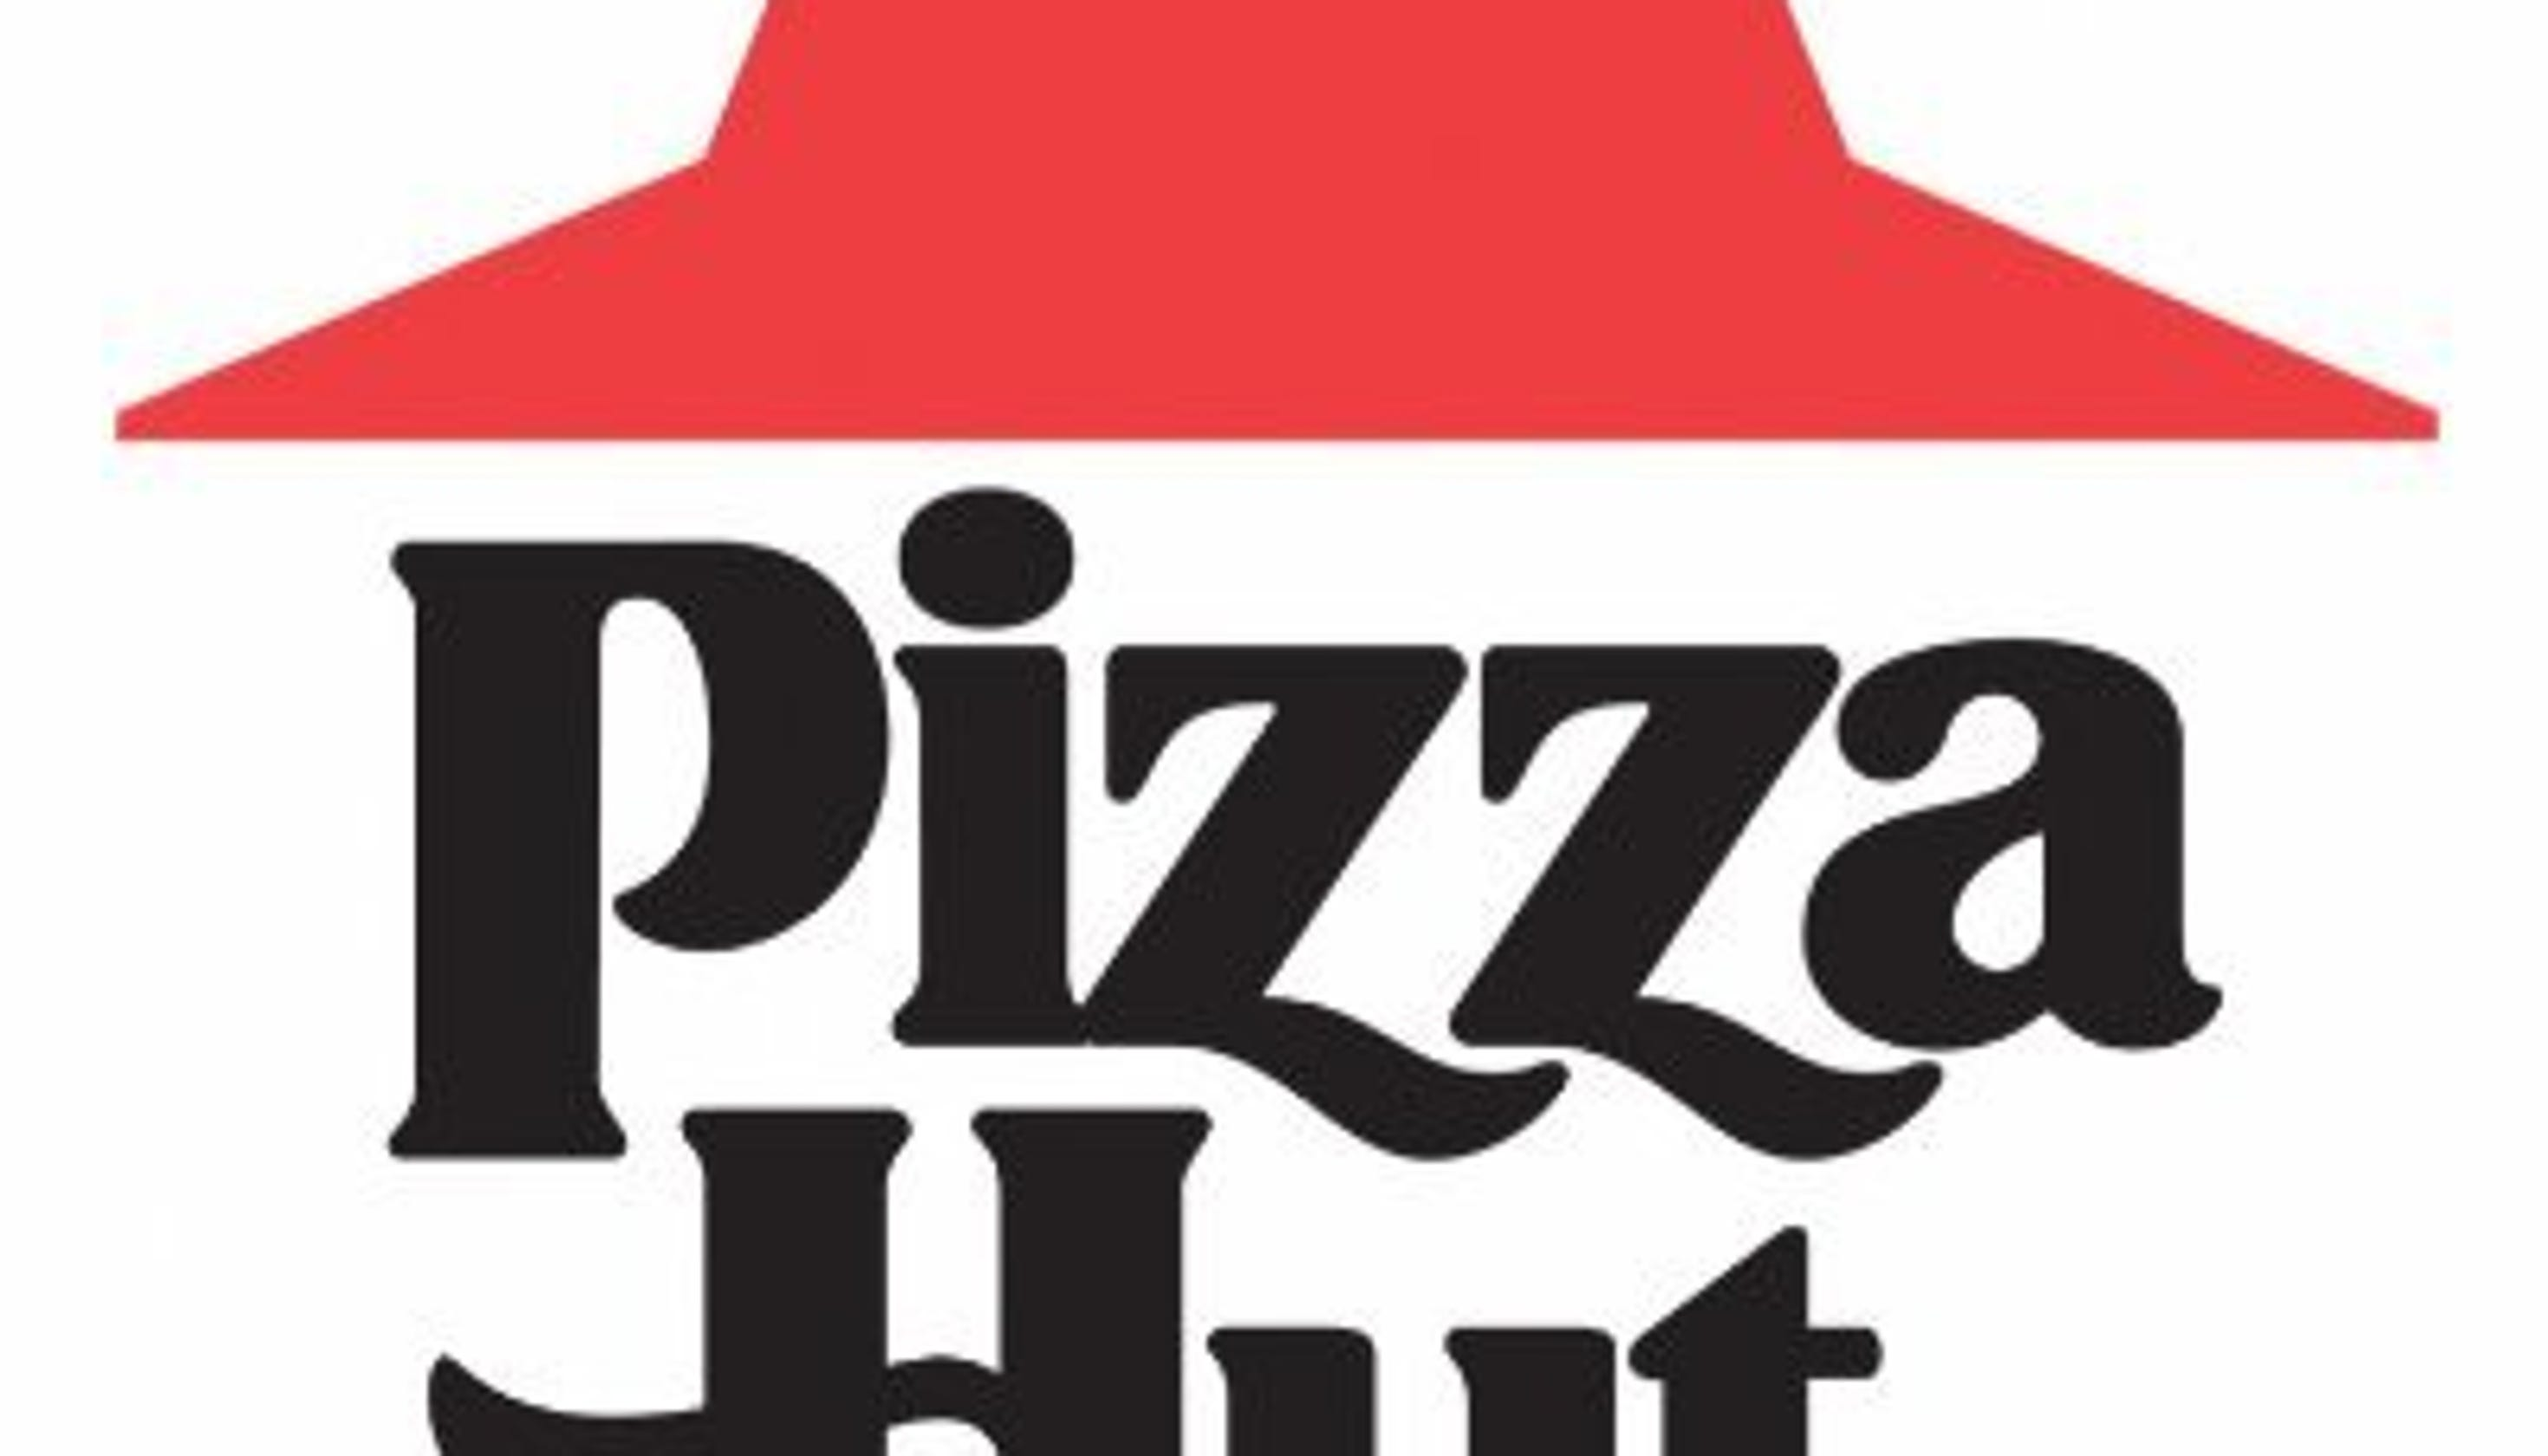 Pizza Hut brings back old logo in effort to revamp brand